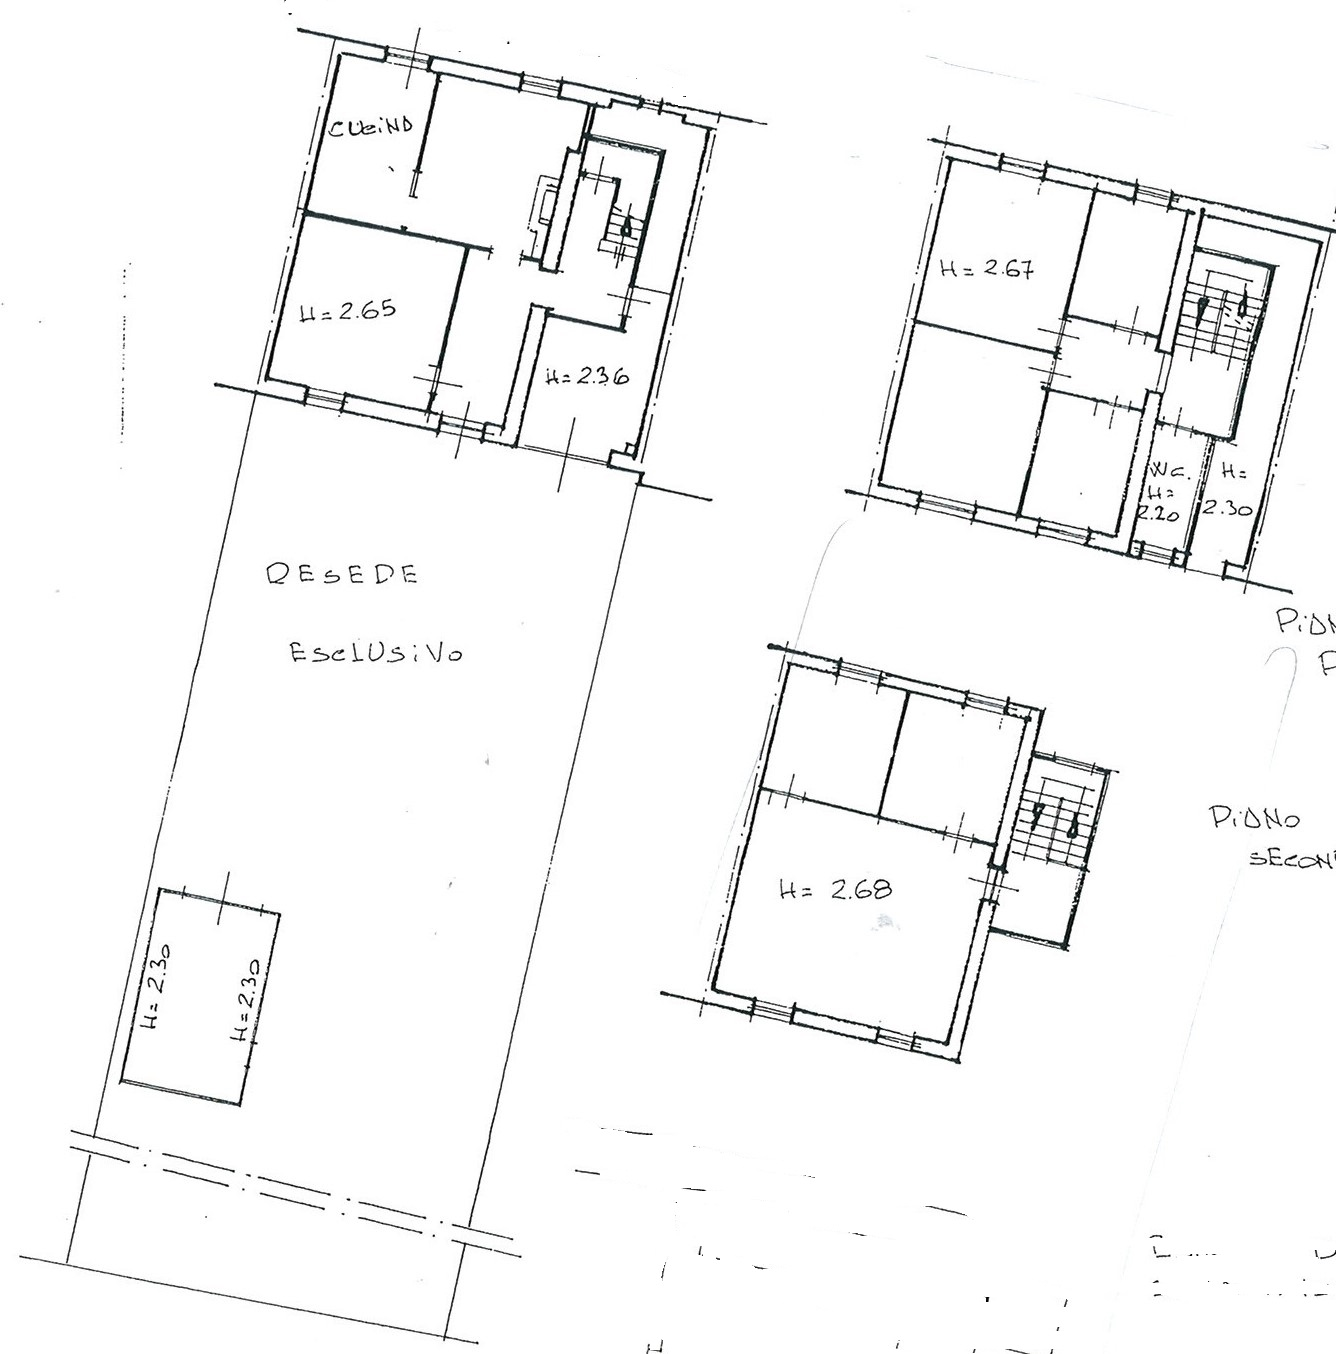 Planimetria 1/1 per rif. trc ssann 160